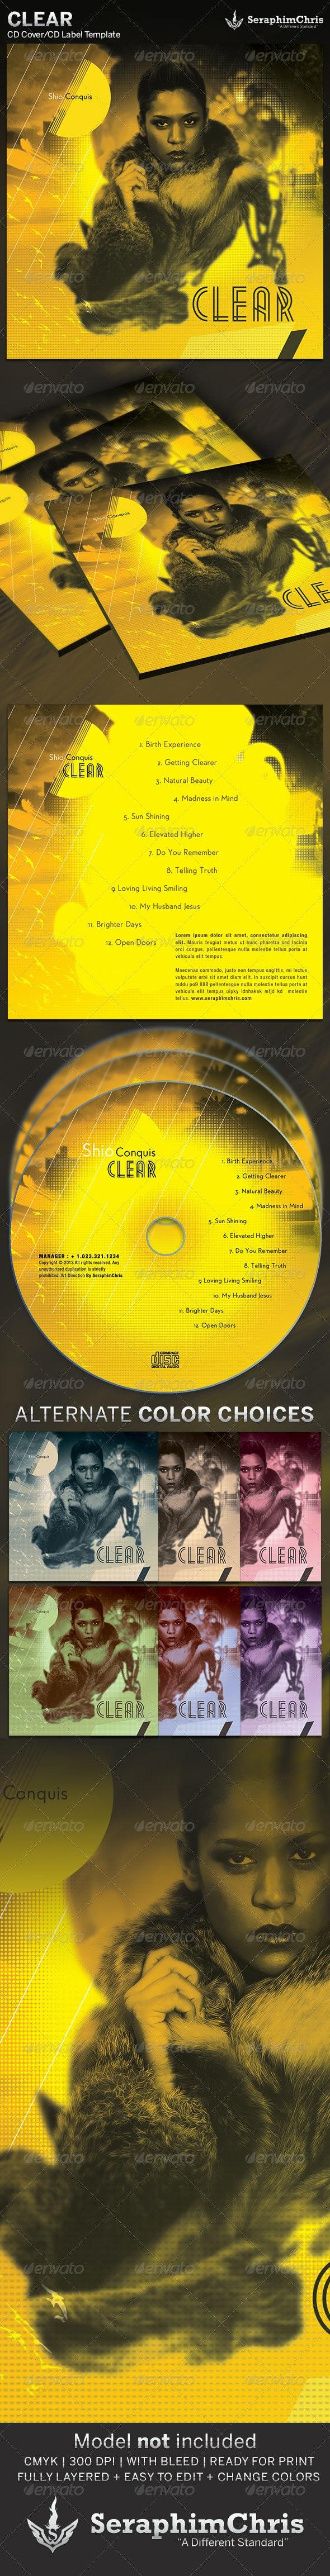 Clear: CD Cover Artwork Template - CD & DVD Artwork Print Templates